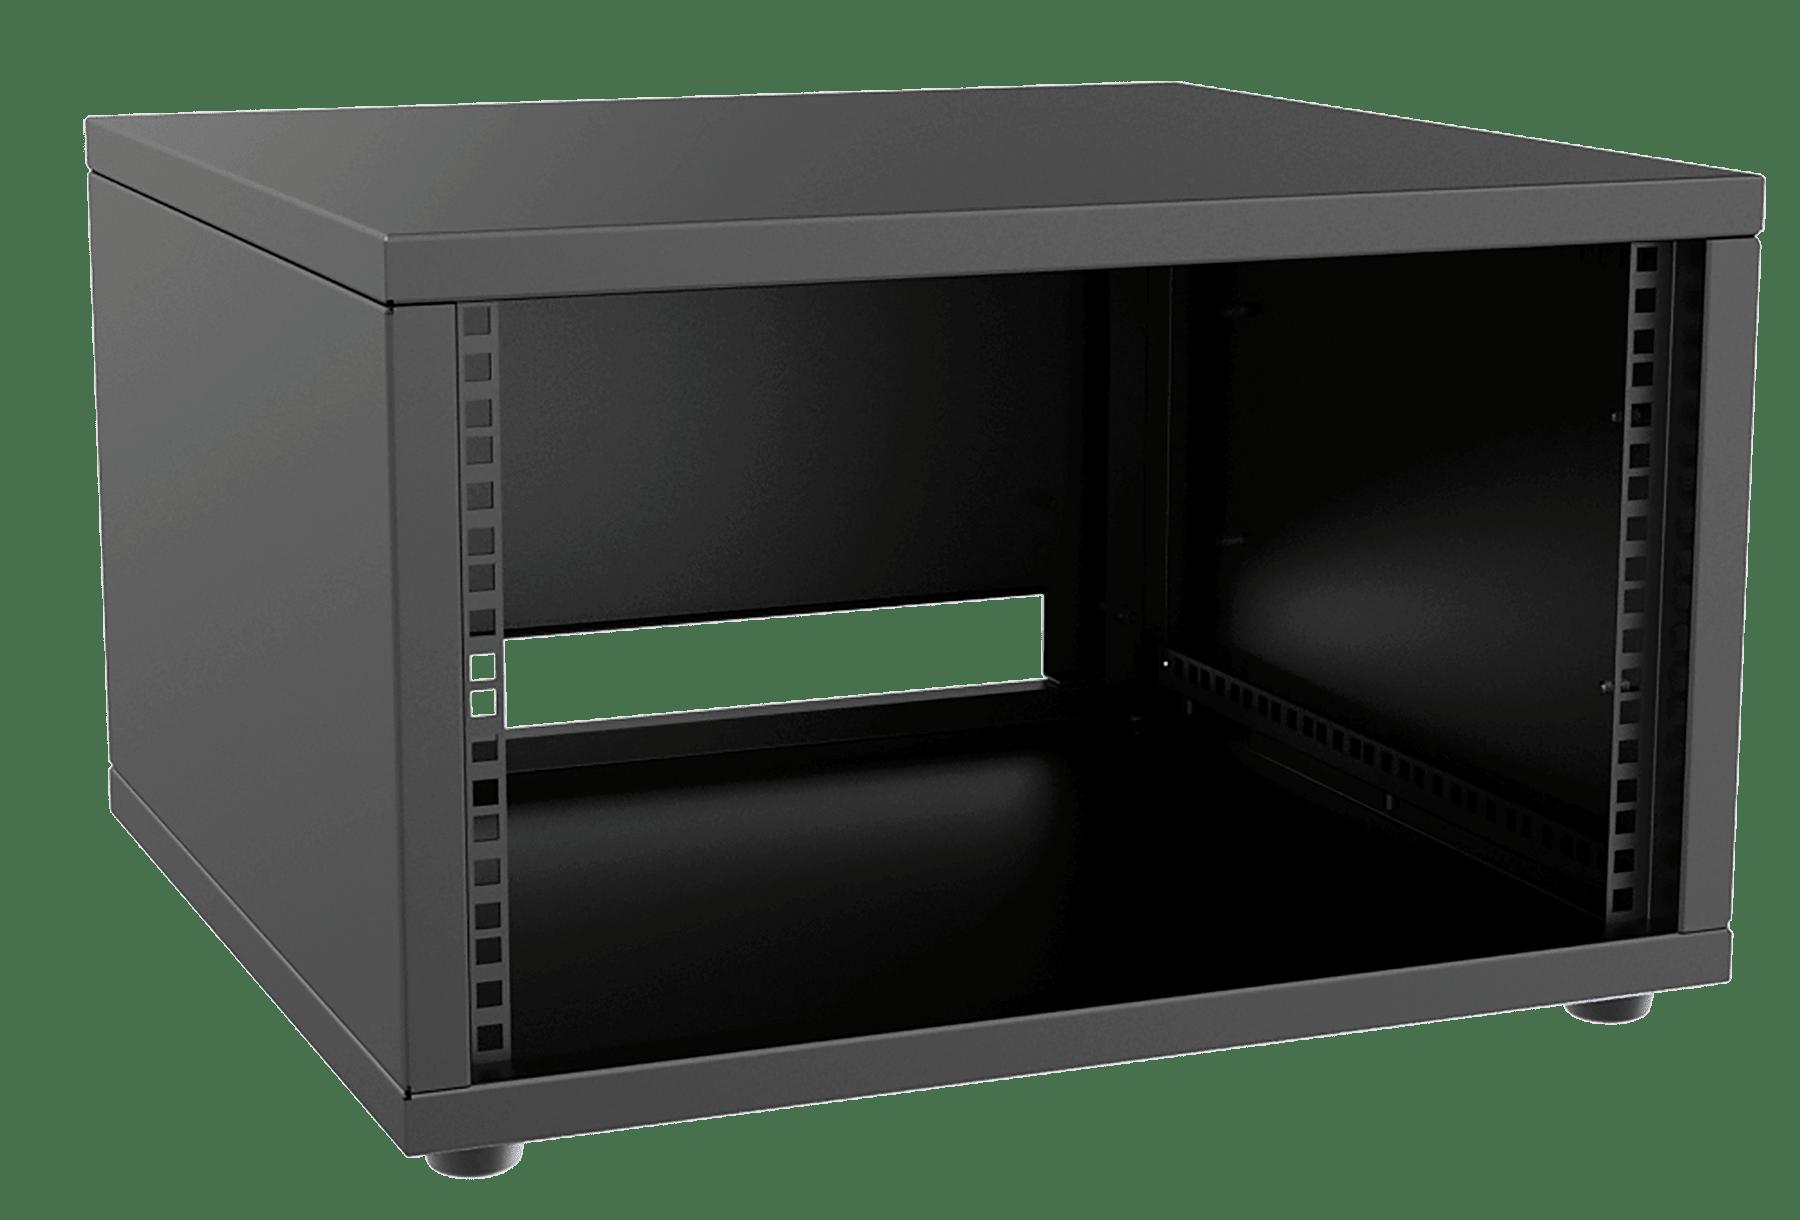 "PR206 - 19"" rack cabinet - 6 units - 500mm depth"